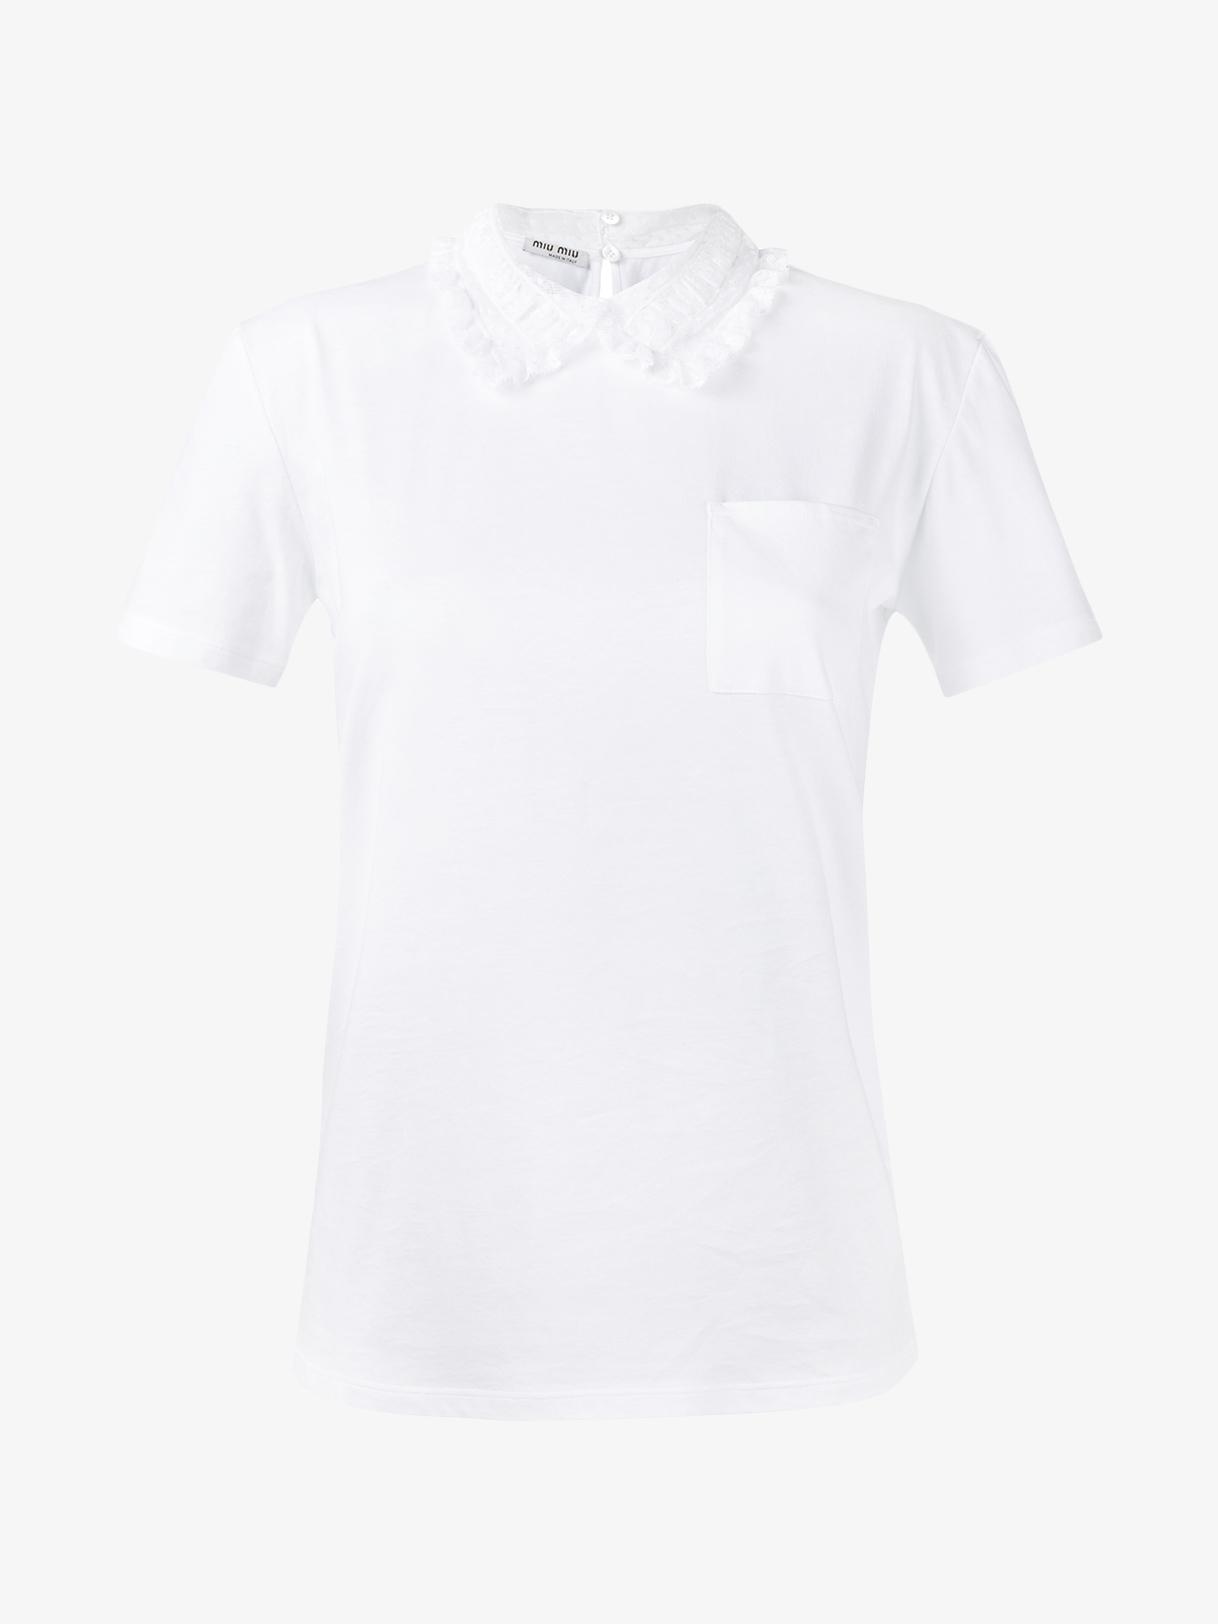 Lyst miu miu t shirt with ruffle collar in black for Miu miu t shirt